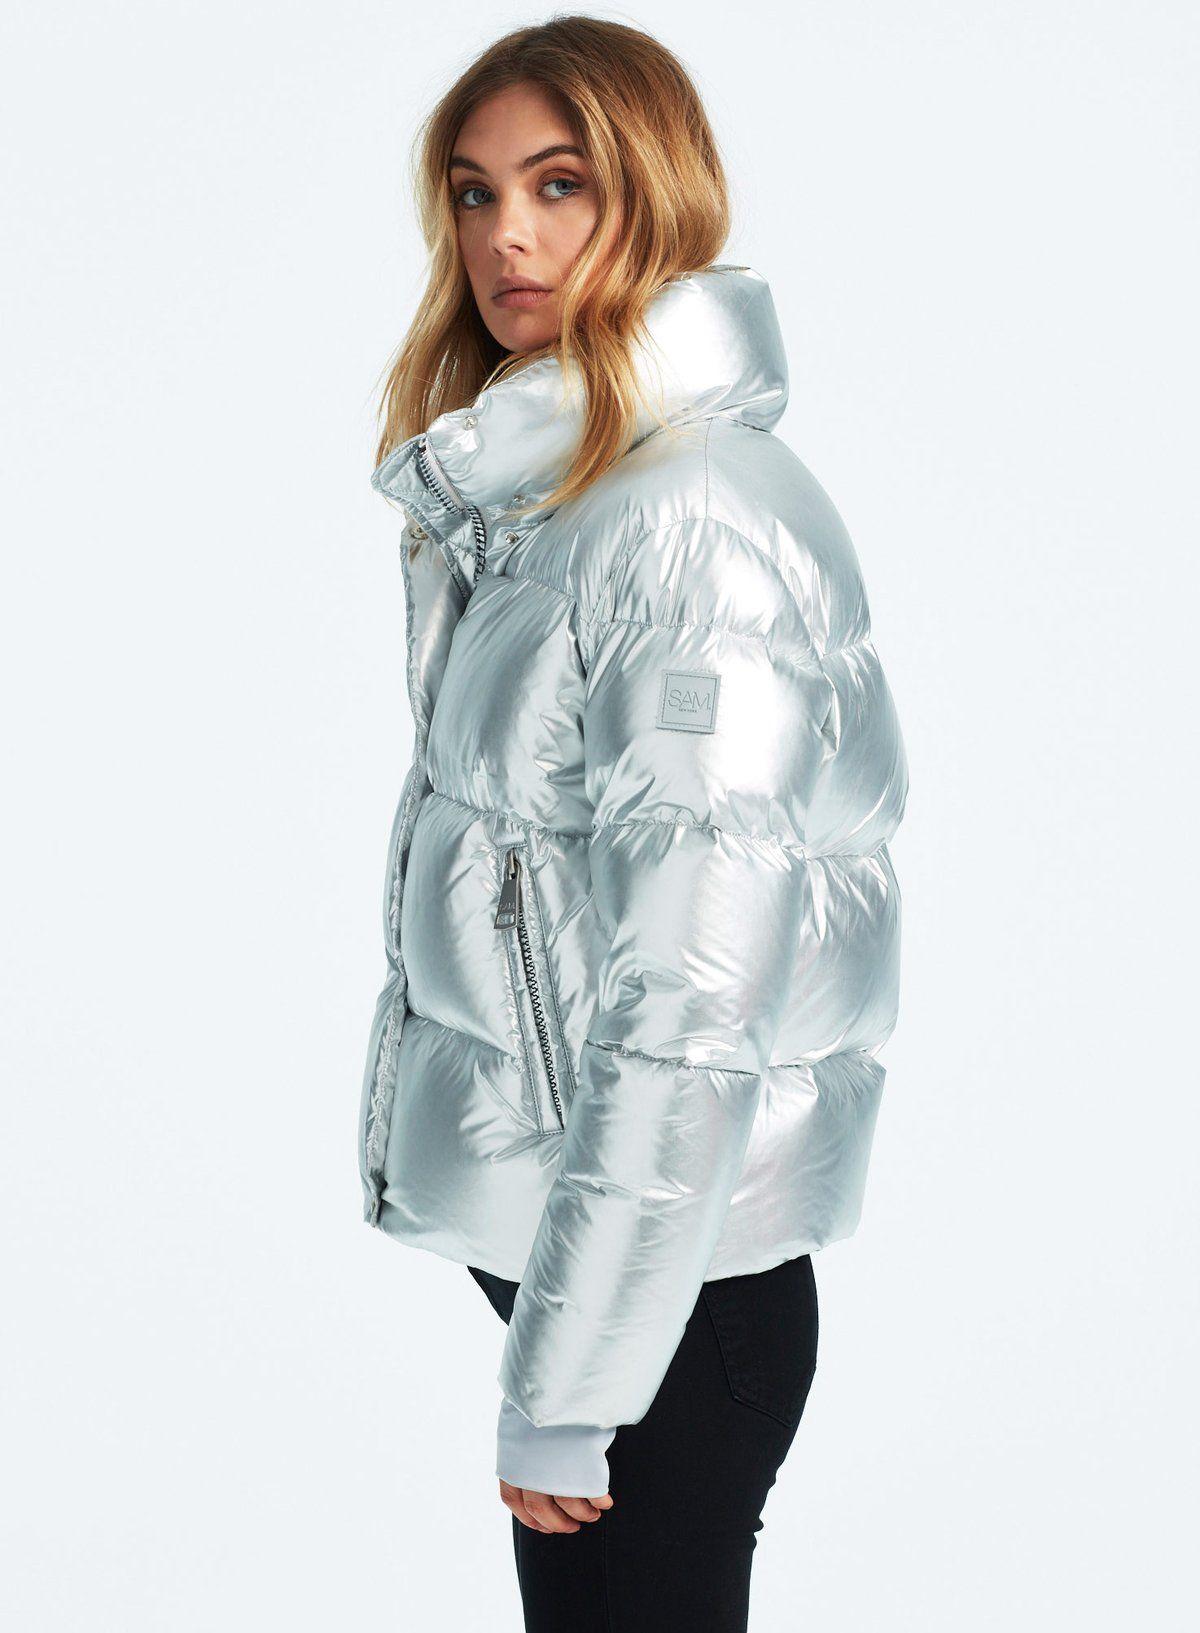 Andi Silver Ice Puffer Jacket Women Outerwear Women Silver Puffer Jacket [ 1633 x 1200 Pixel ]